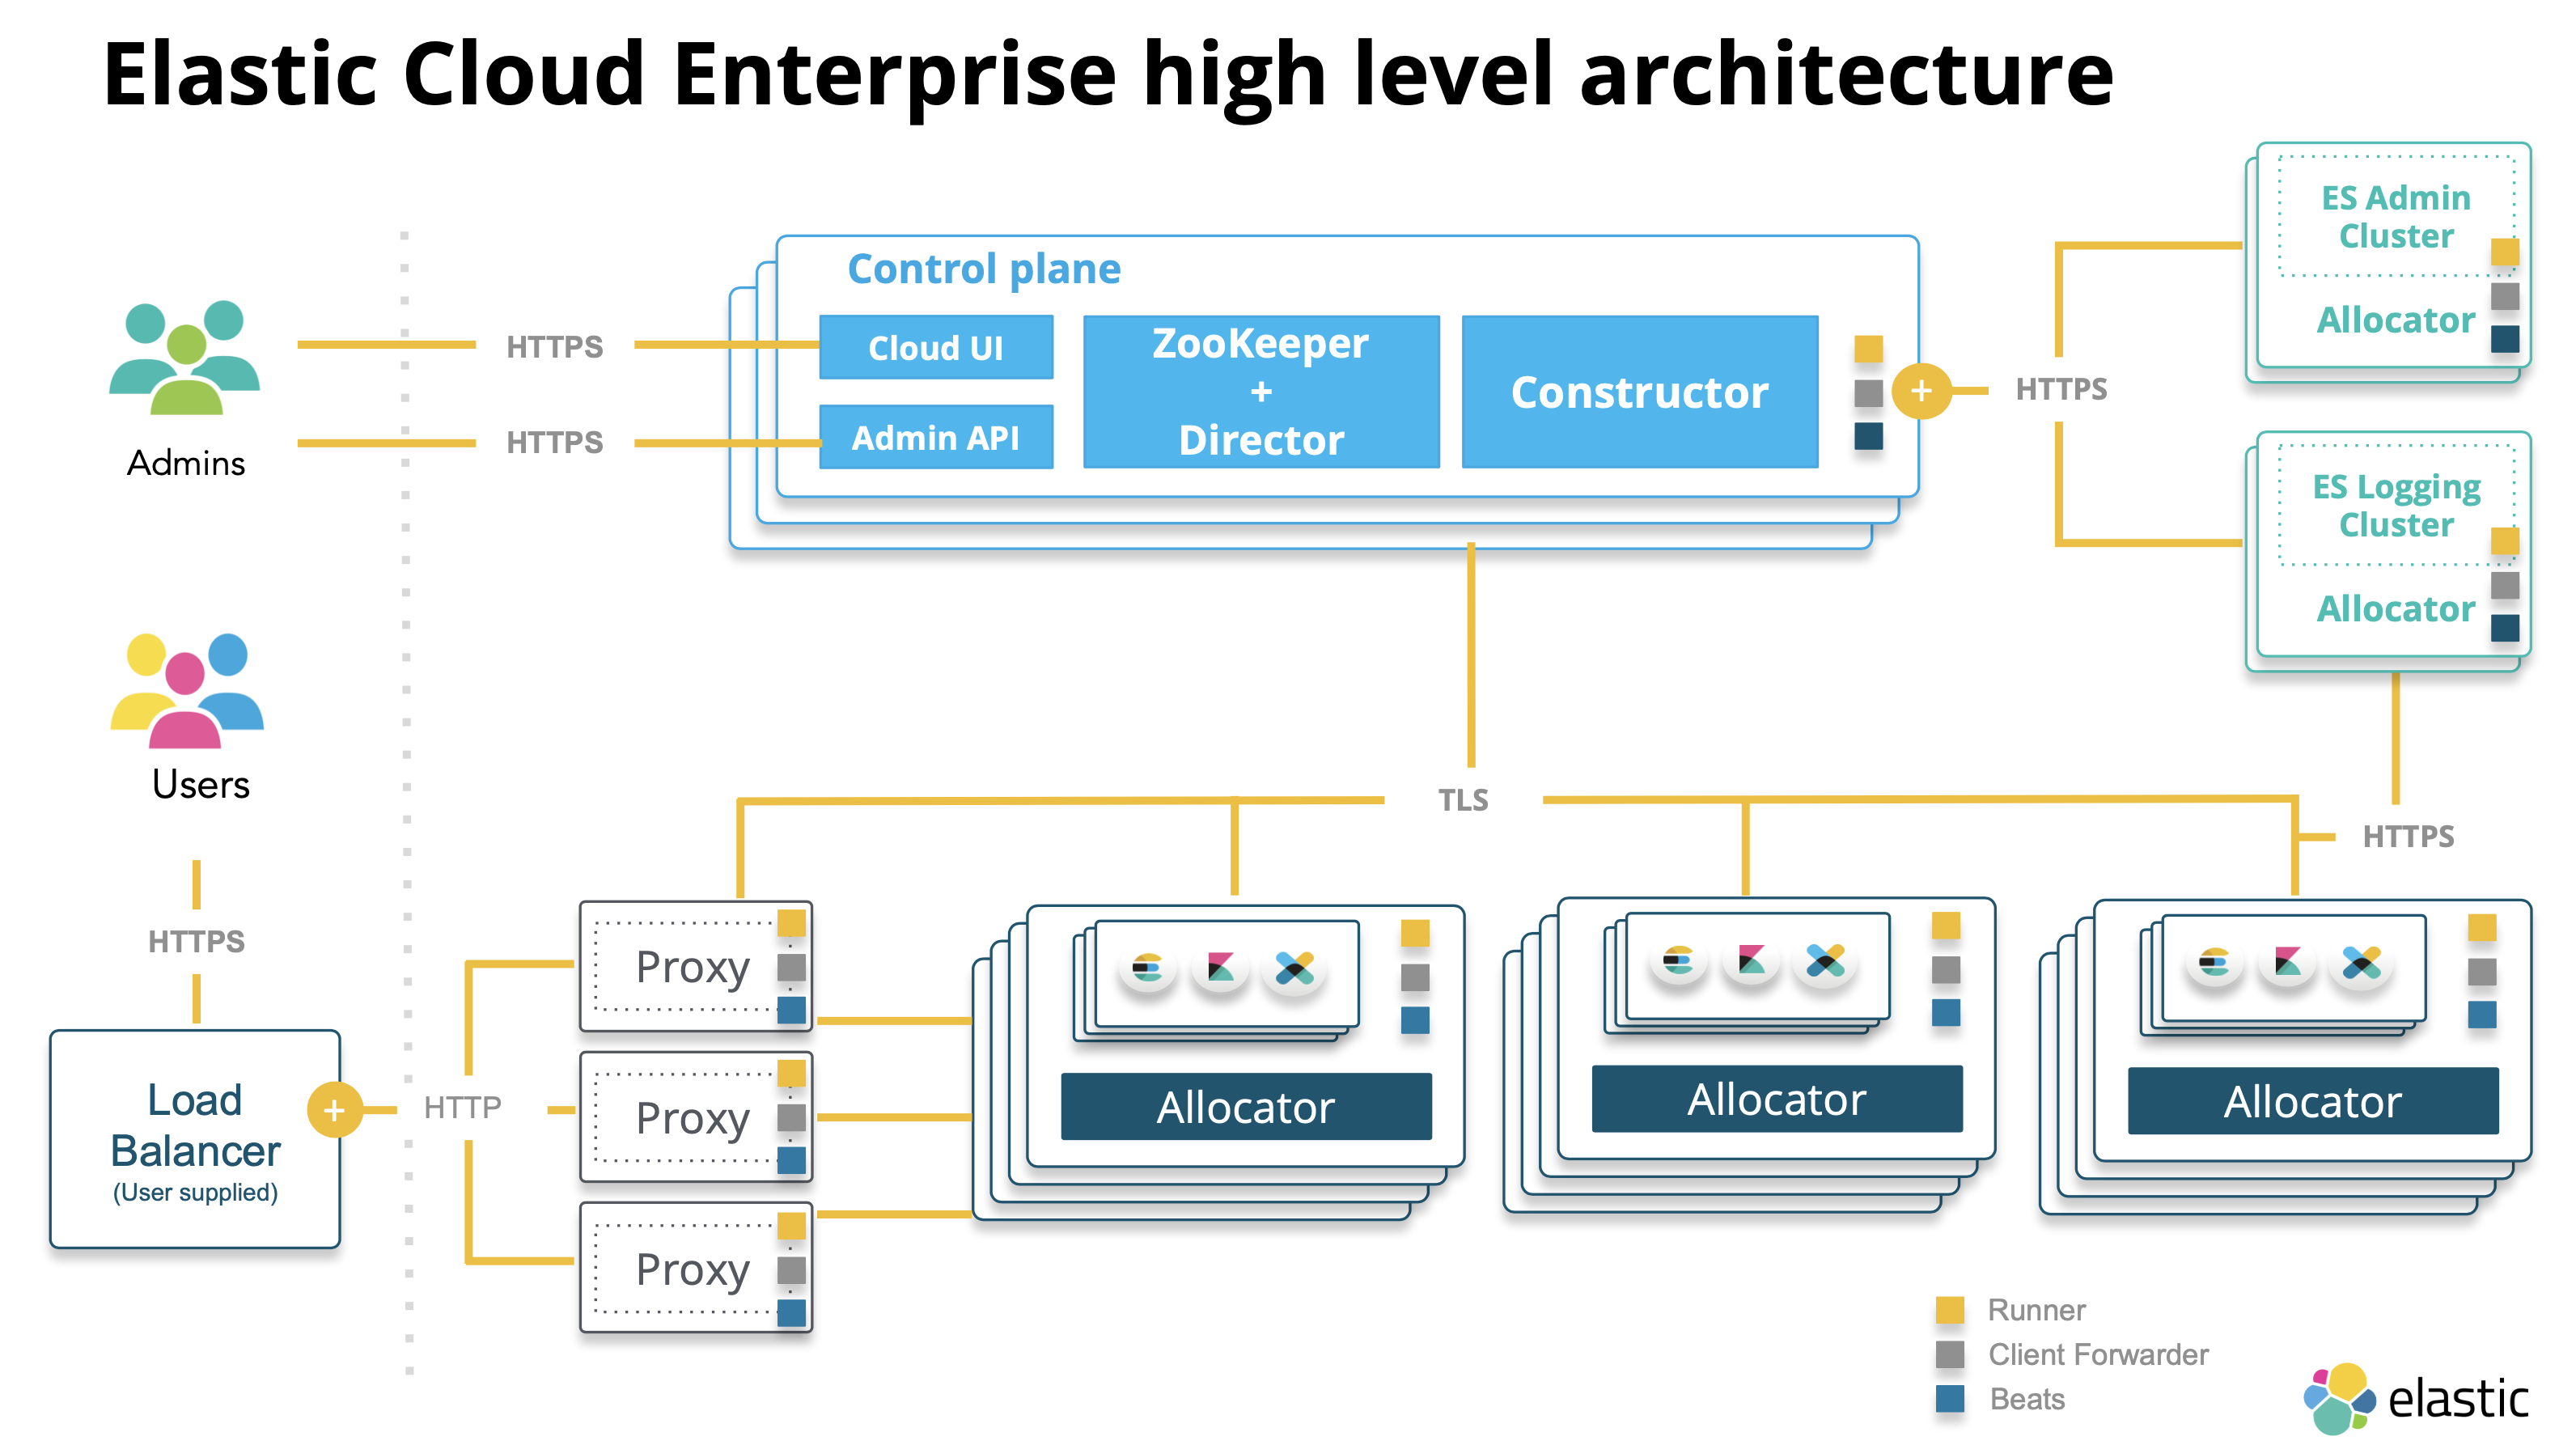 Architecture | Elastic Cloud Enterprise Reference [2 3